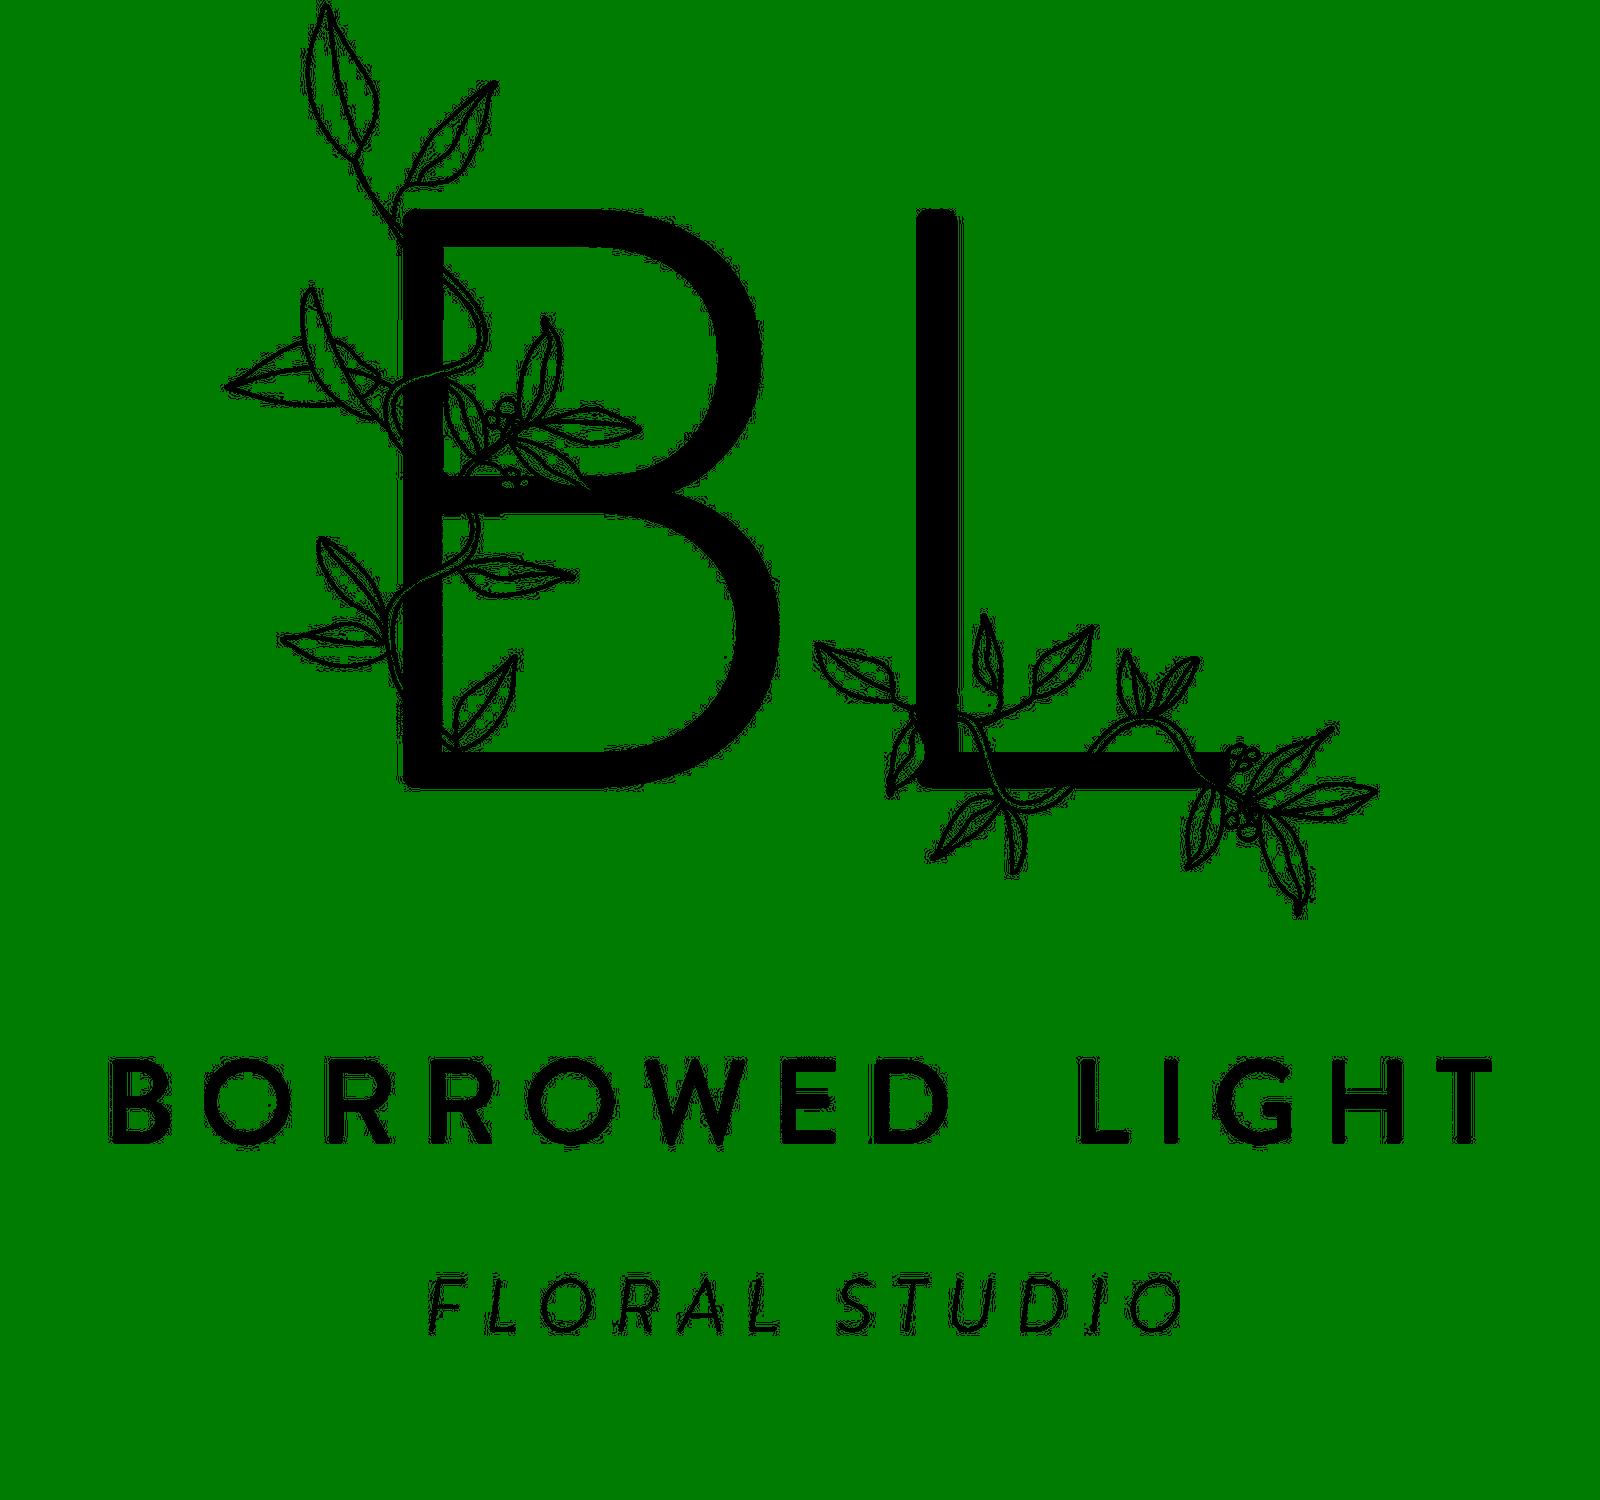 Borrowed Light logo. Initials with leaf design